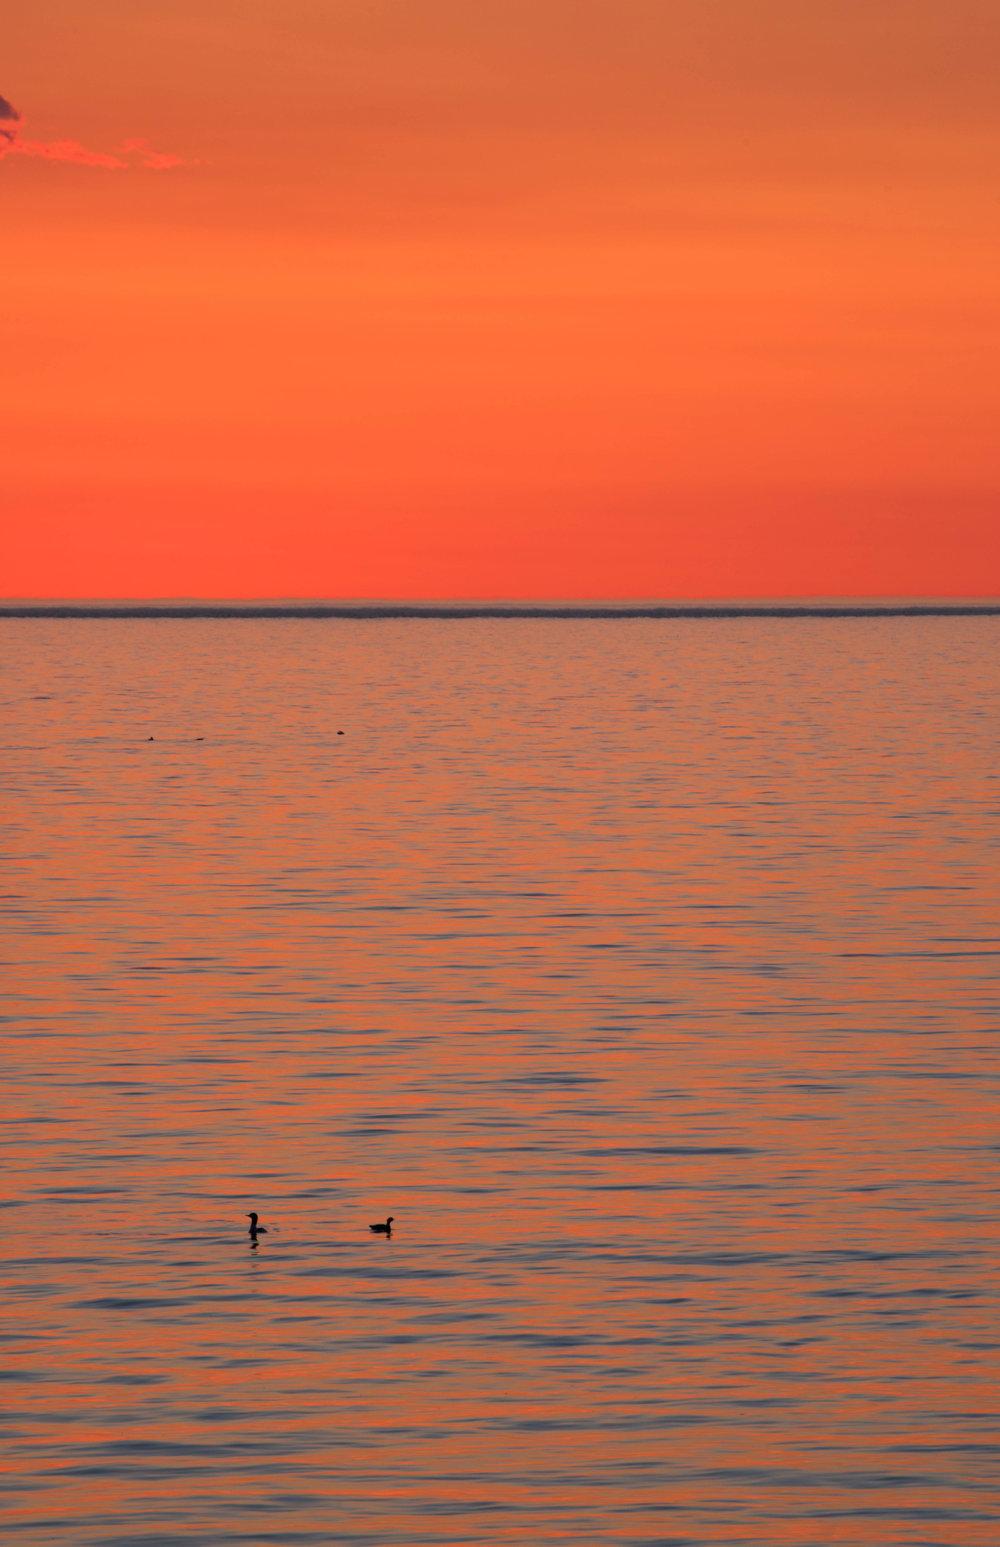 sunrise ducks - silver bay, minnesota   from US$15